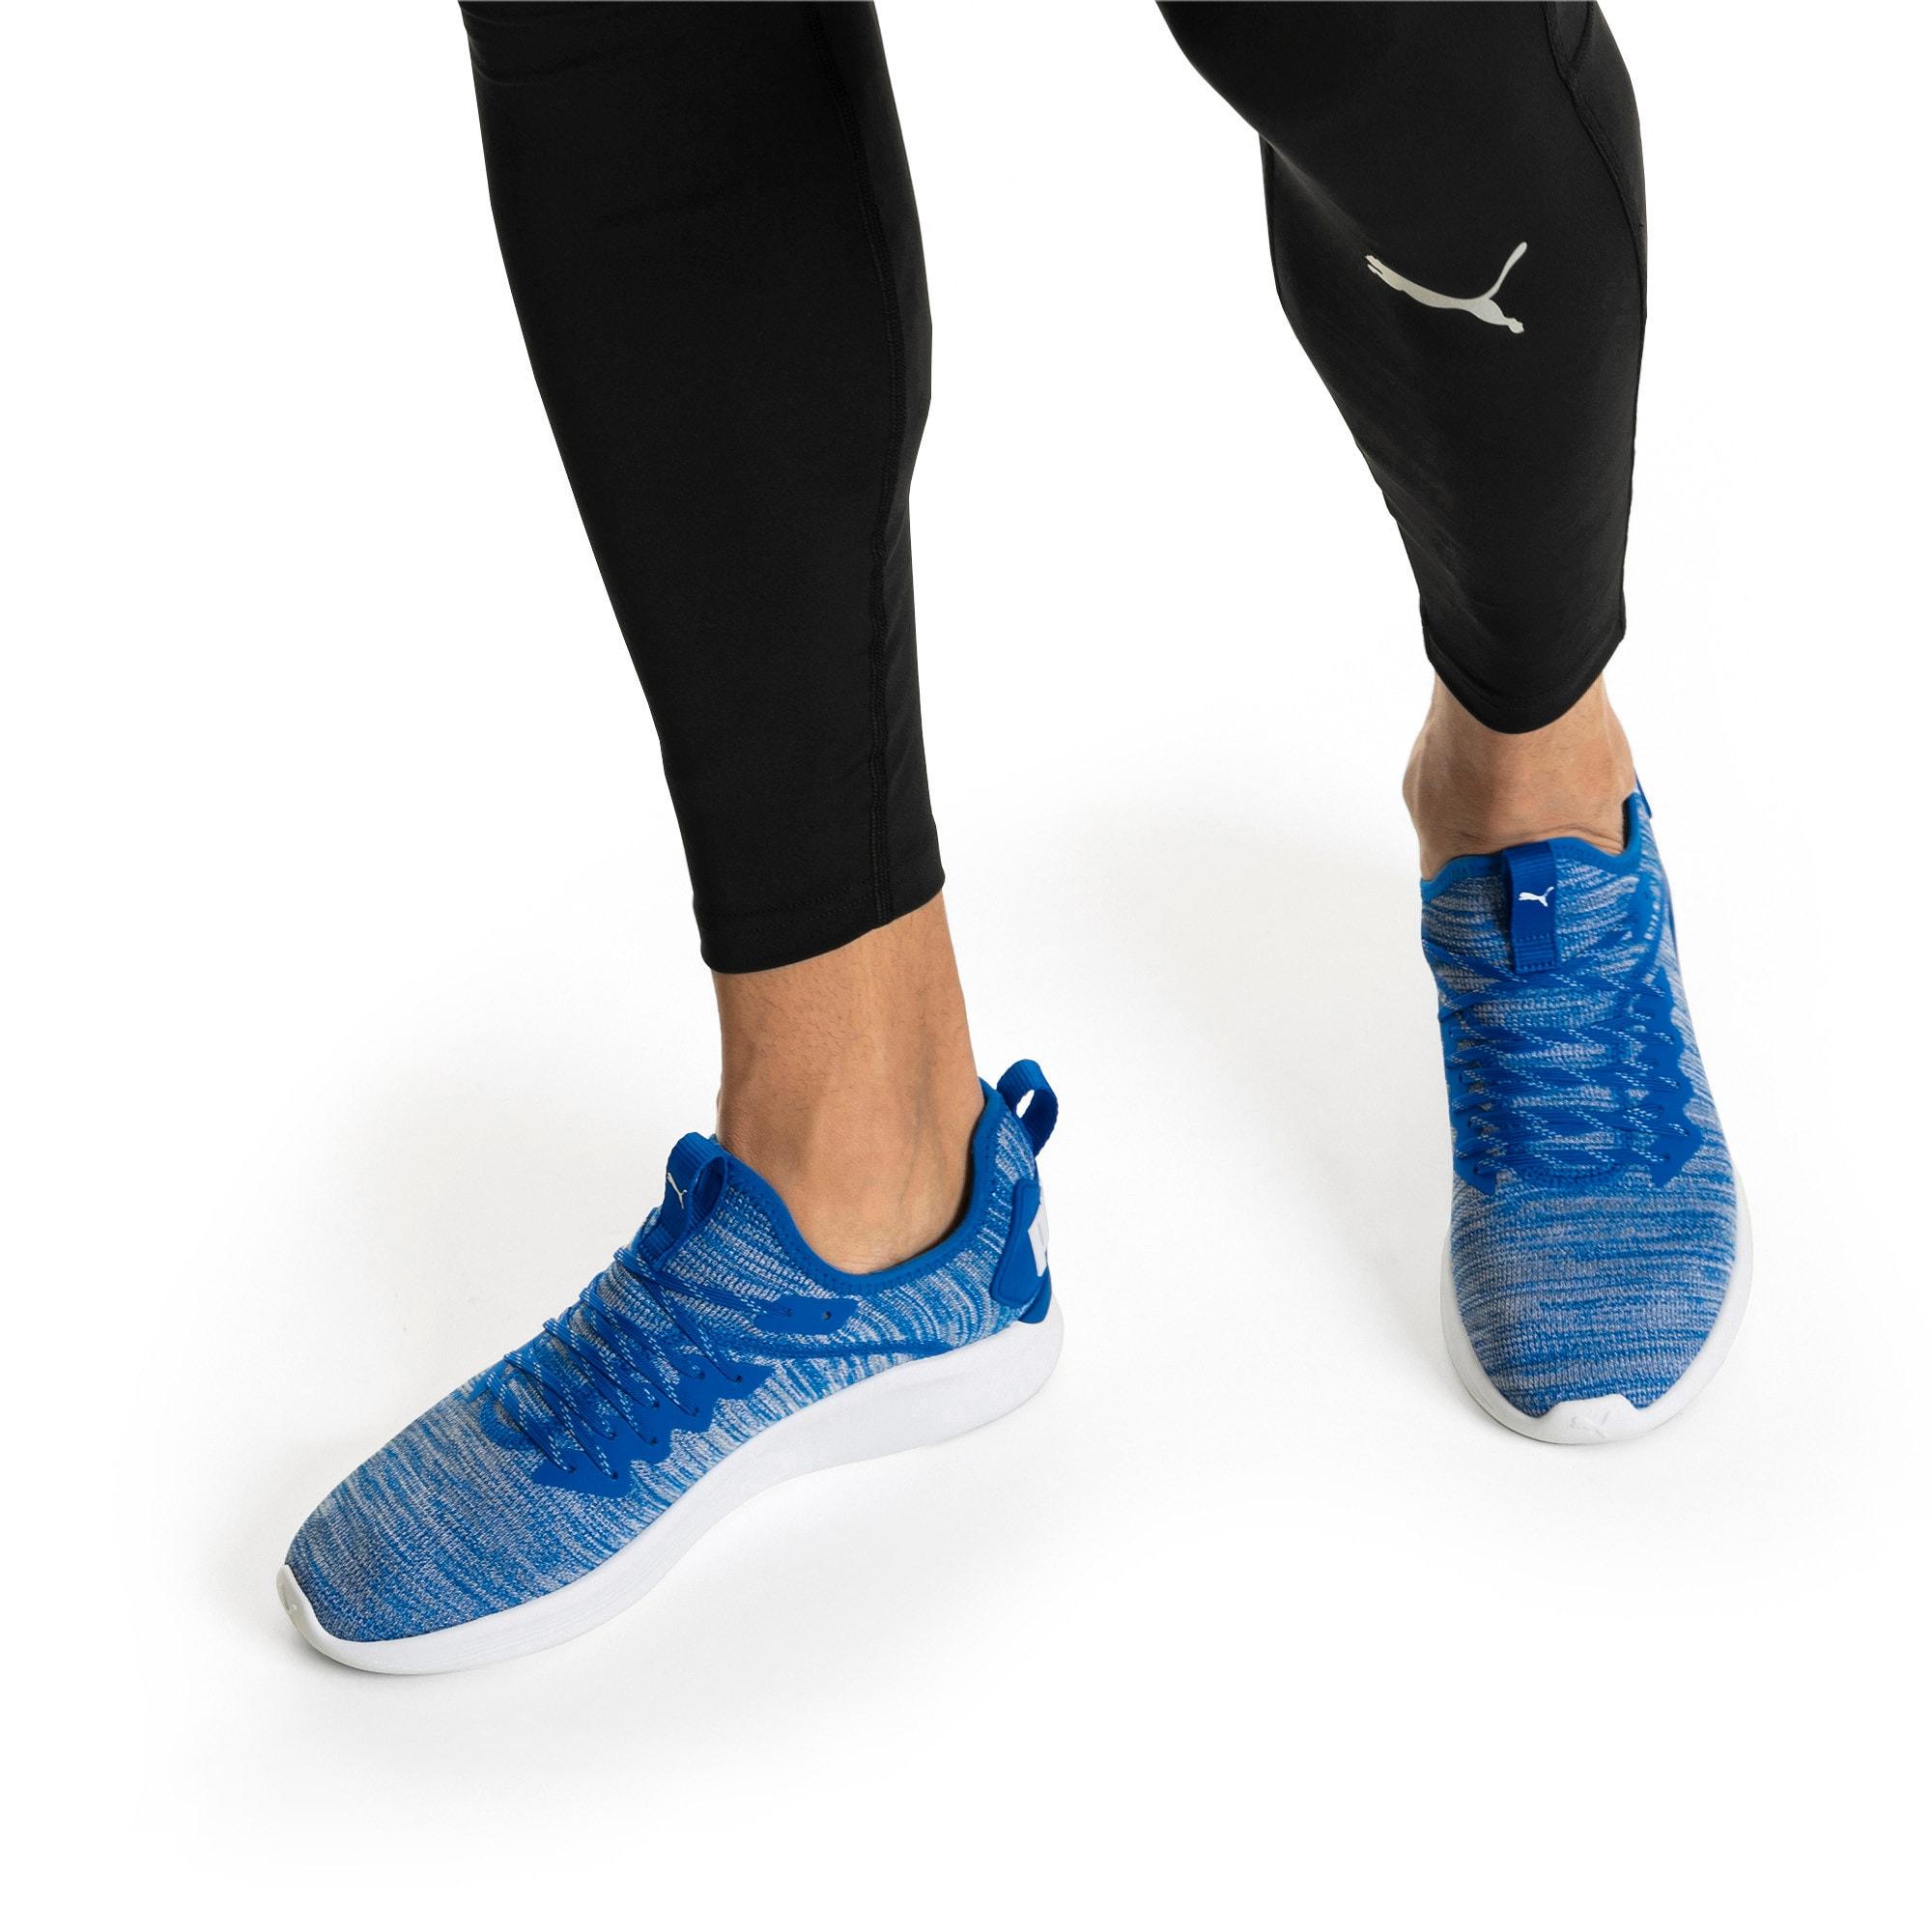 Thumbnail 8 of IGNITE Flash evoKNIT Men's Training Shoes, Strong Blue-White, medium-IND